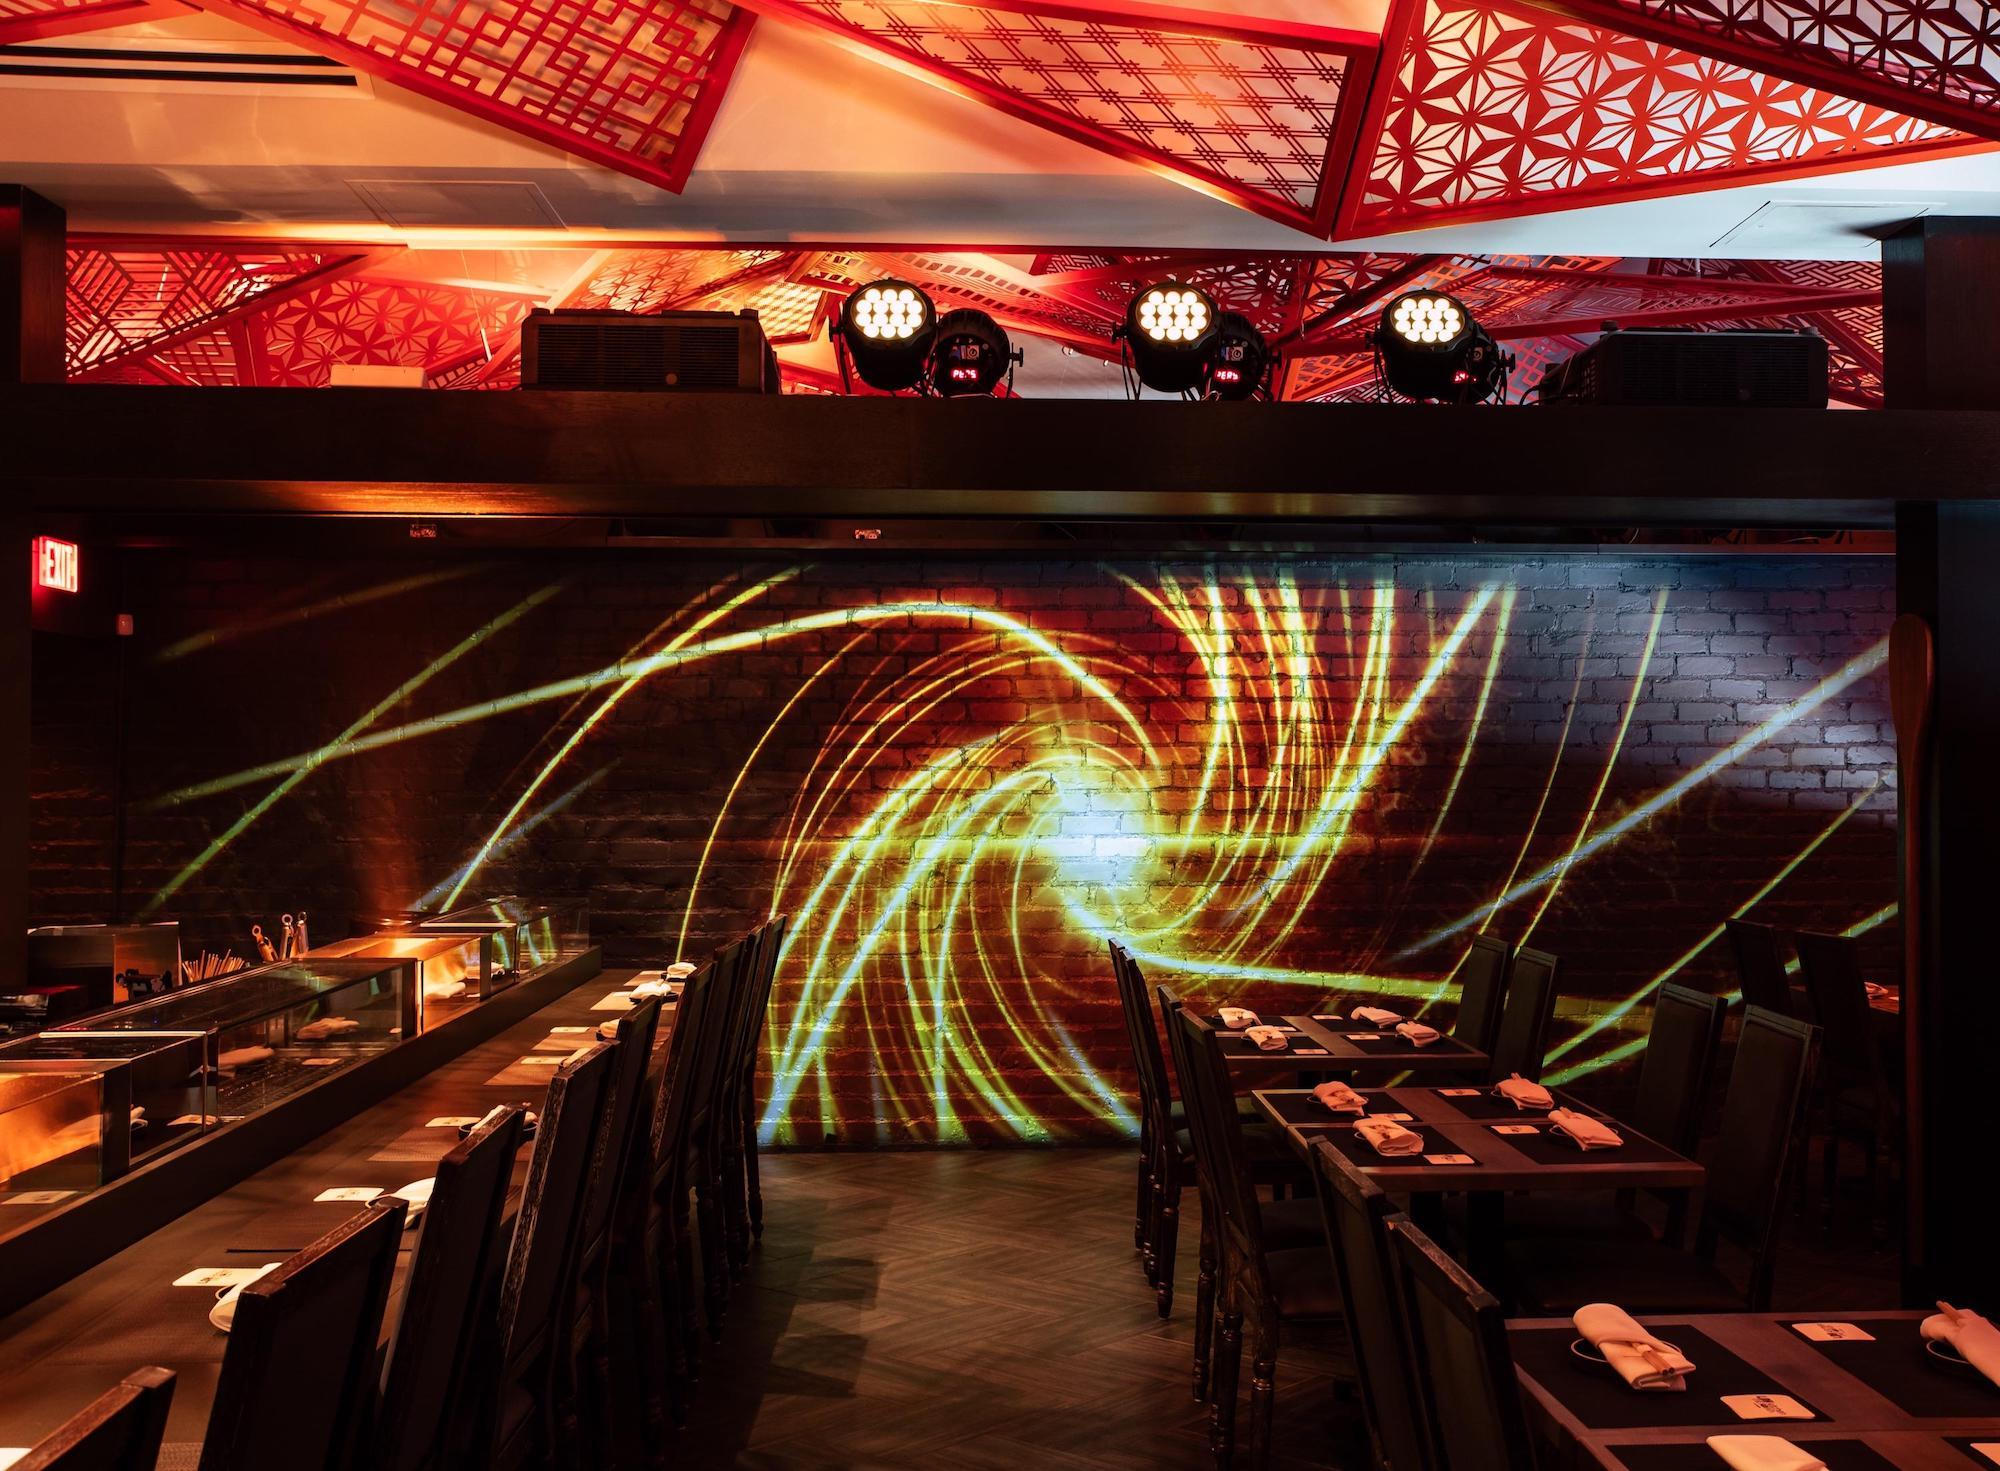 Santa Monica's Wild New Japanese Robata Does an Insane Nightly Light Show